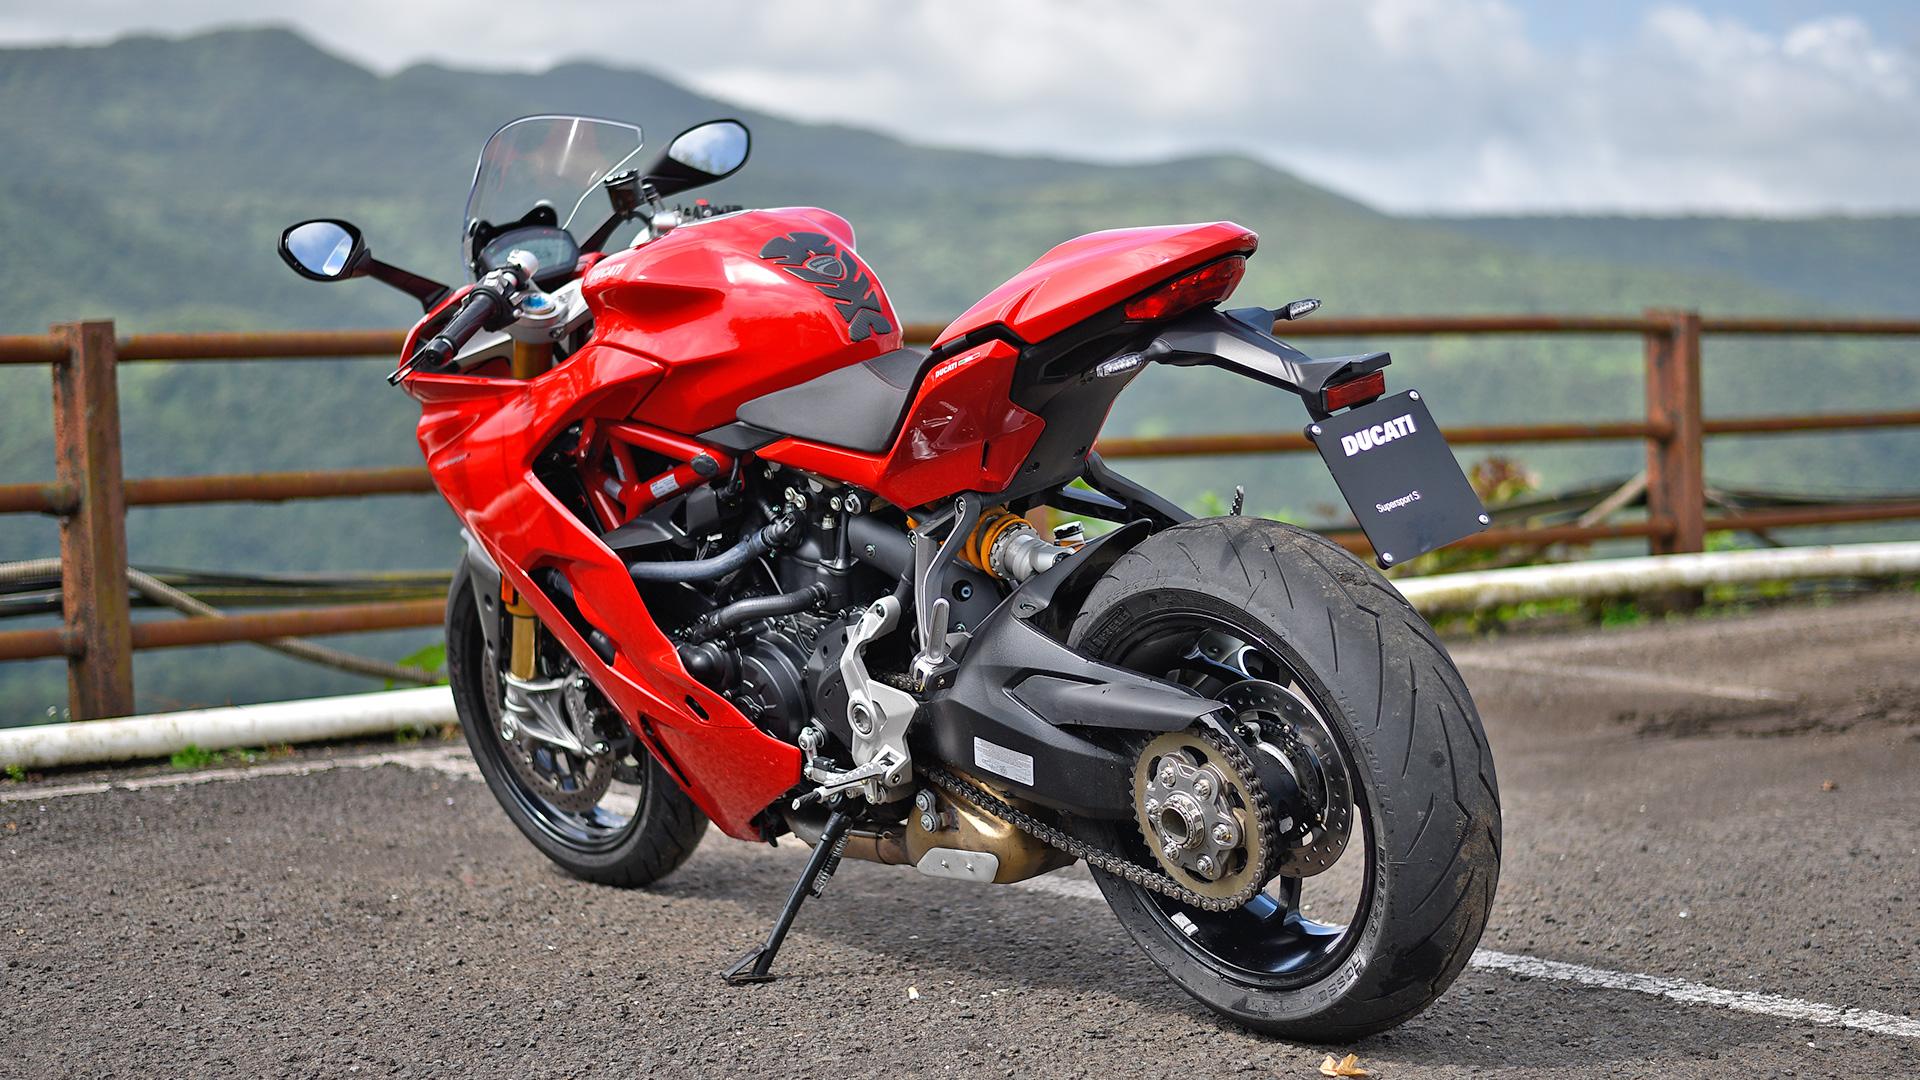 Ducati 939 Supersport 2017 S Compare